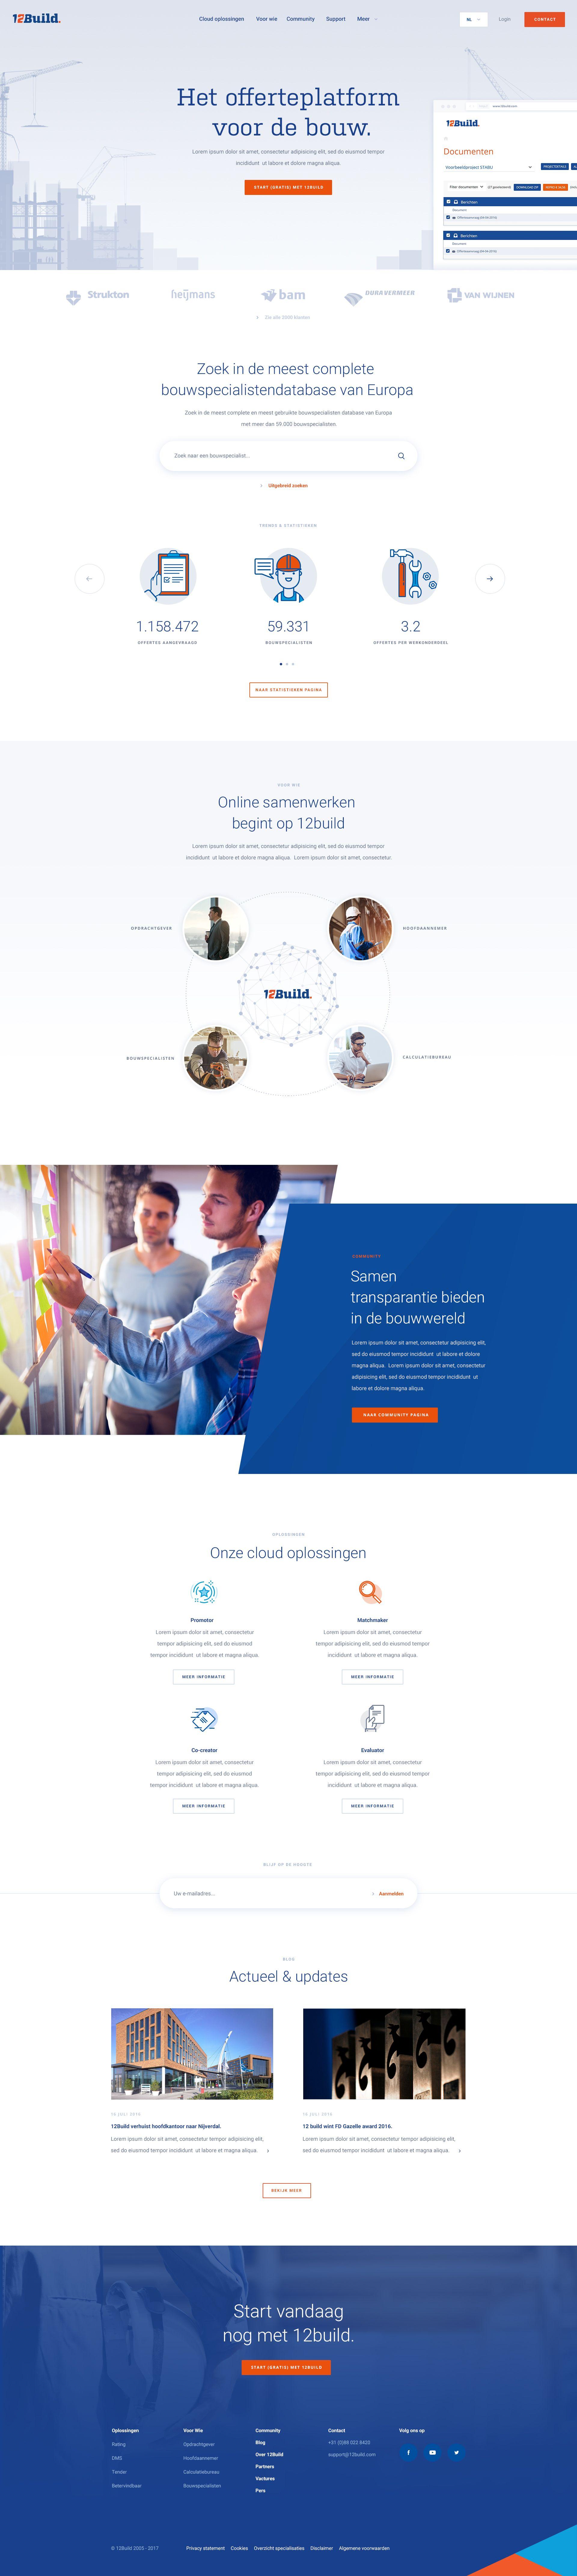 Stunning Site Design Inspiration Gallery - Joshkrajcik.us ...